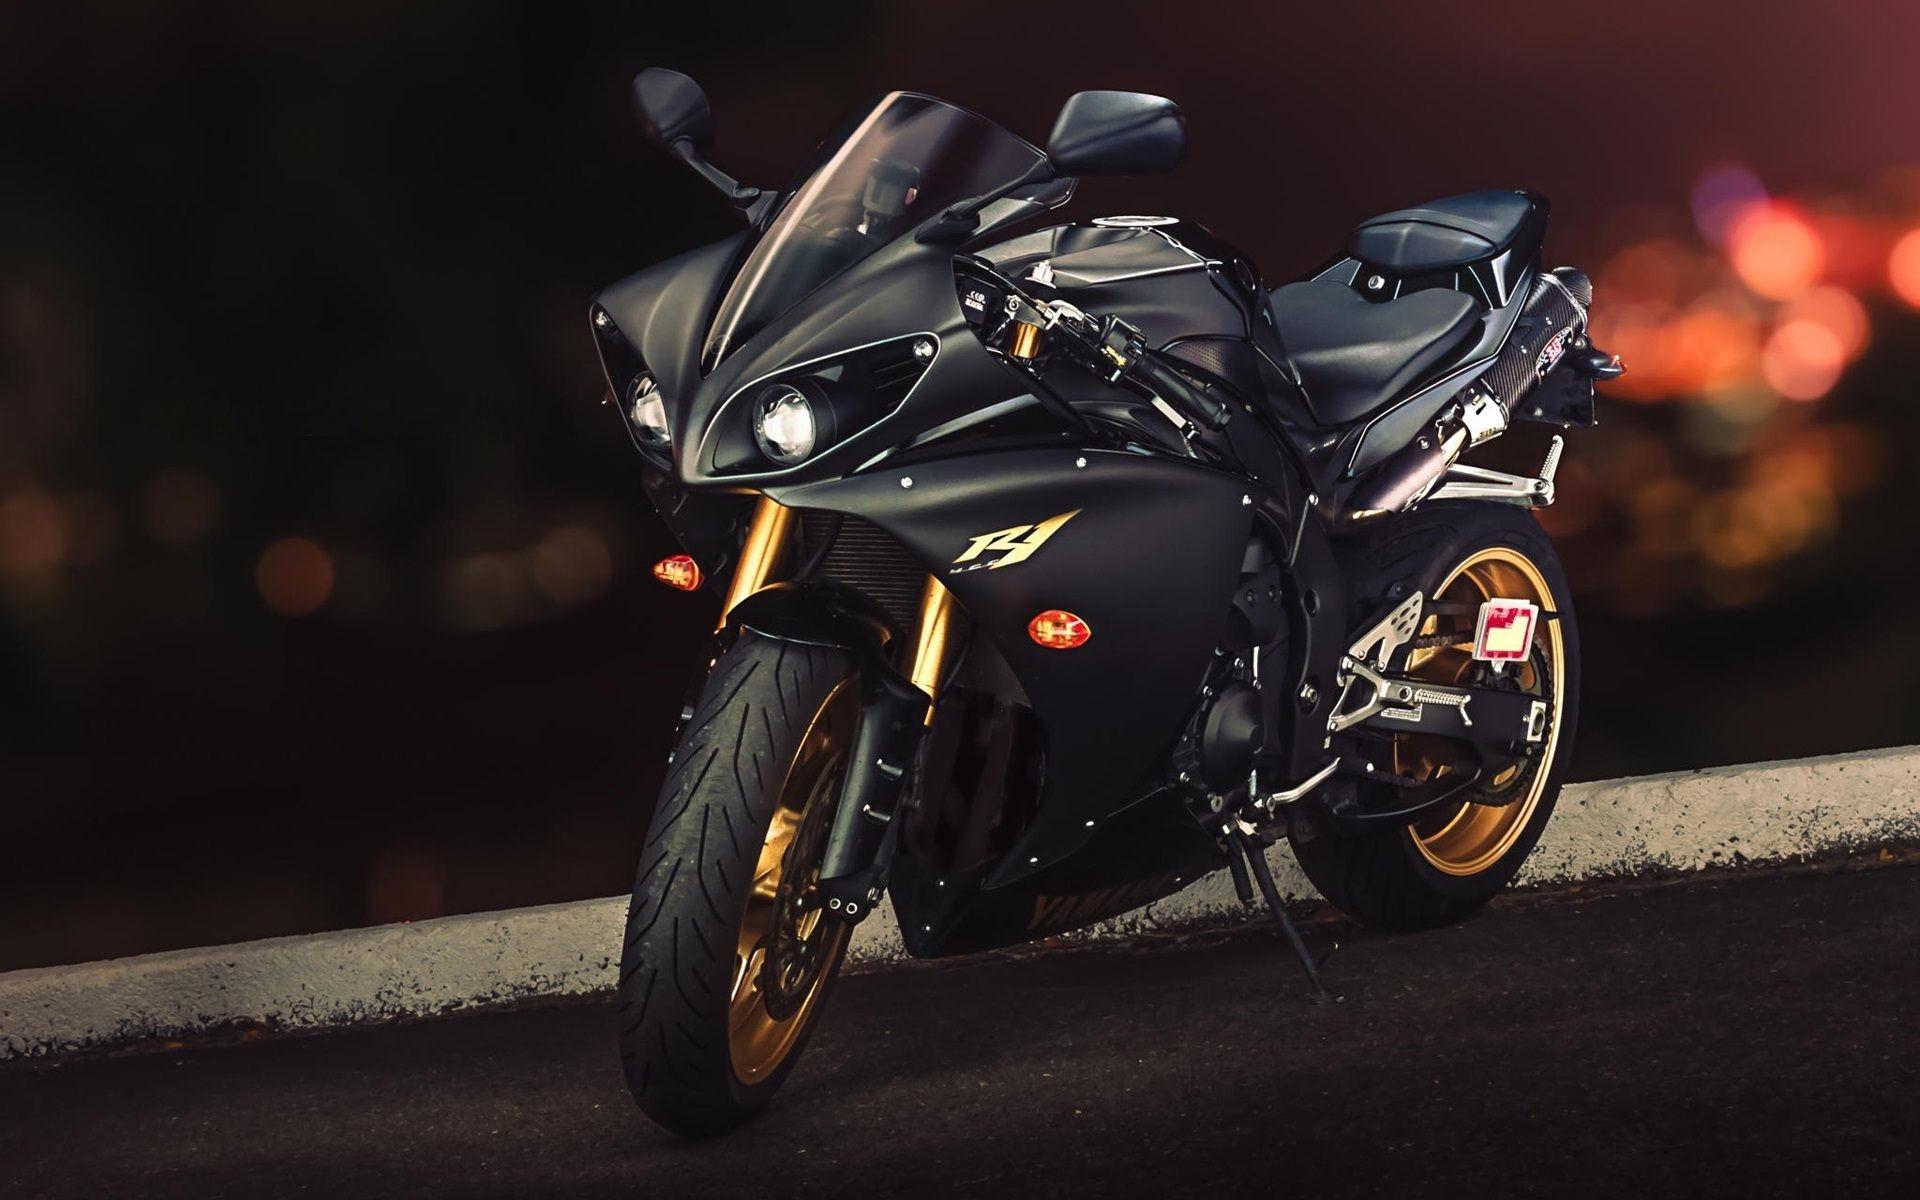 Motorcycle Wallpaper Desktop Bendera Road Race Fox Racing Hd Anak .